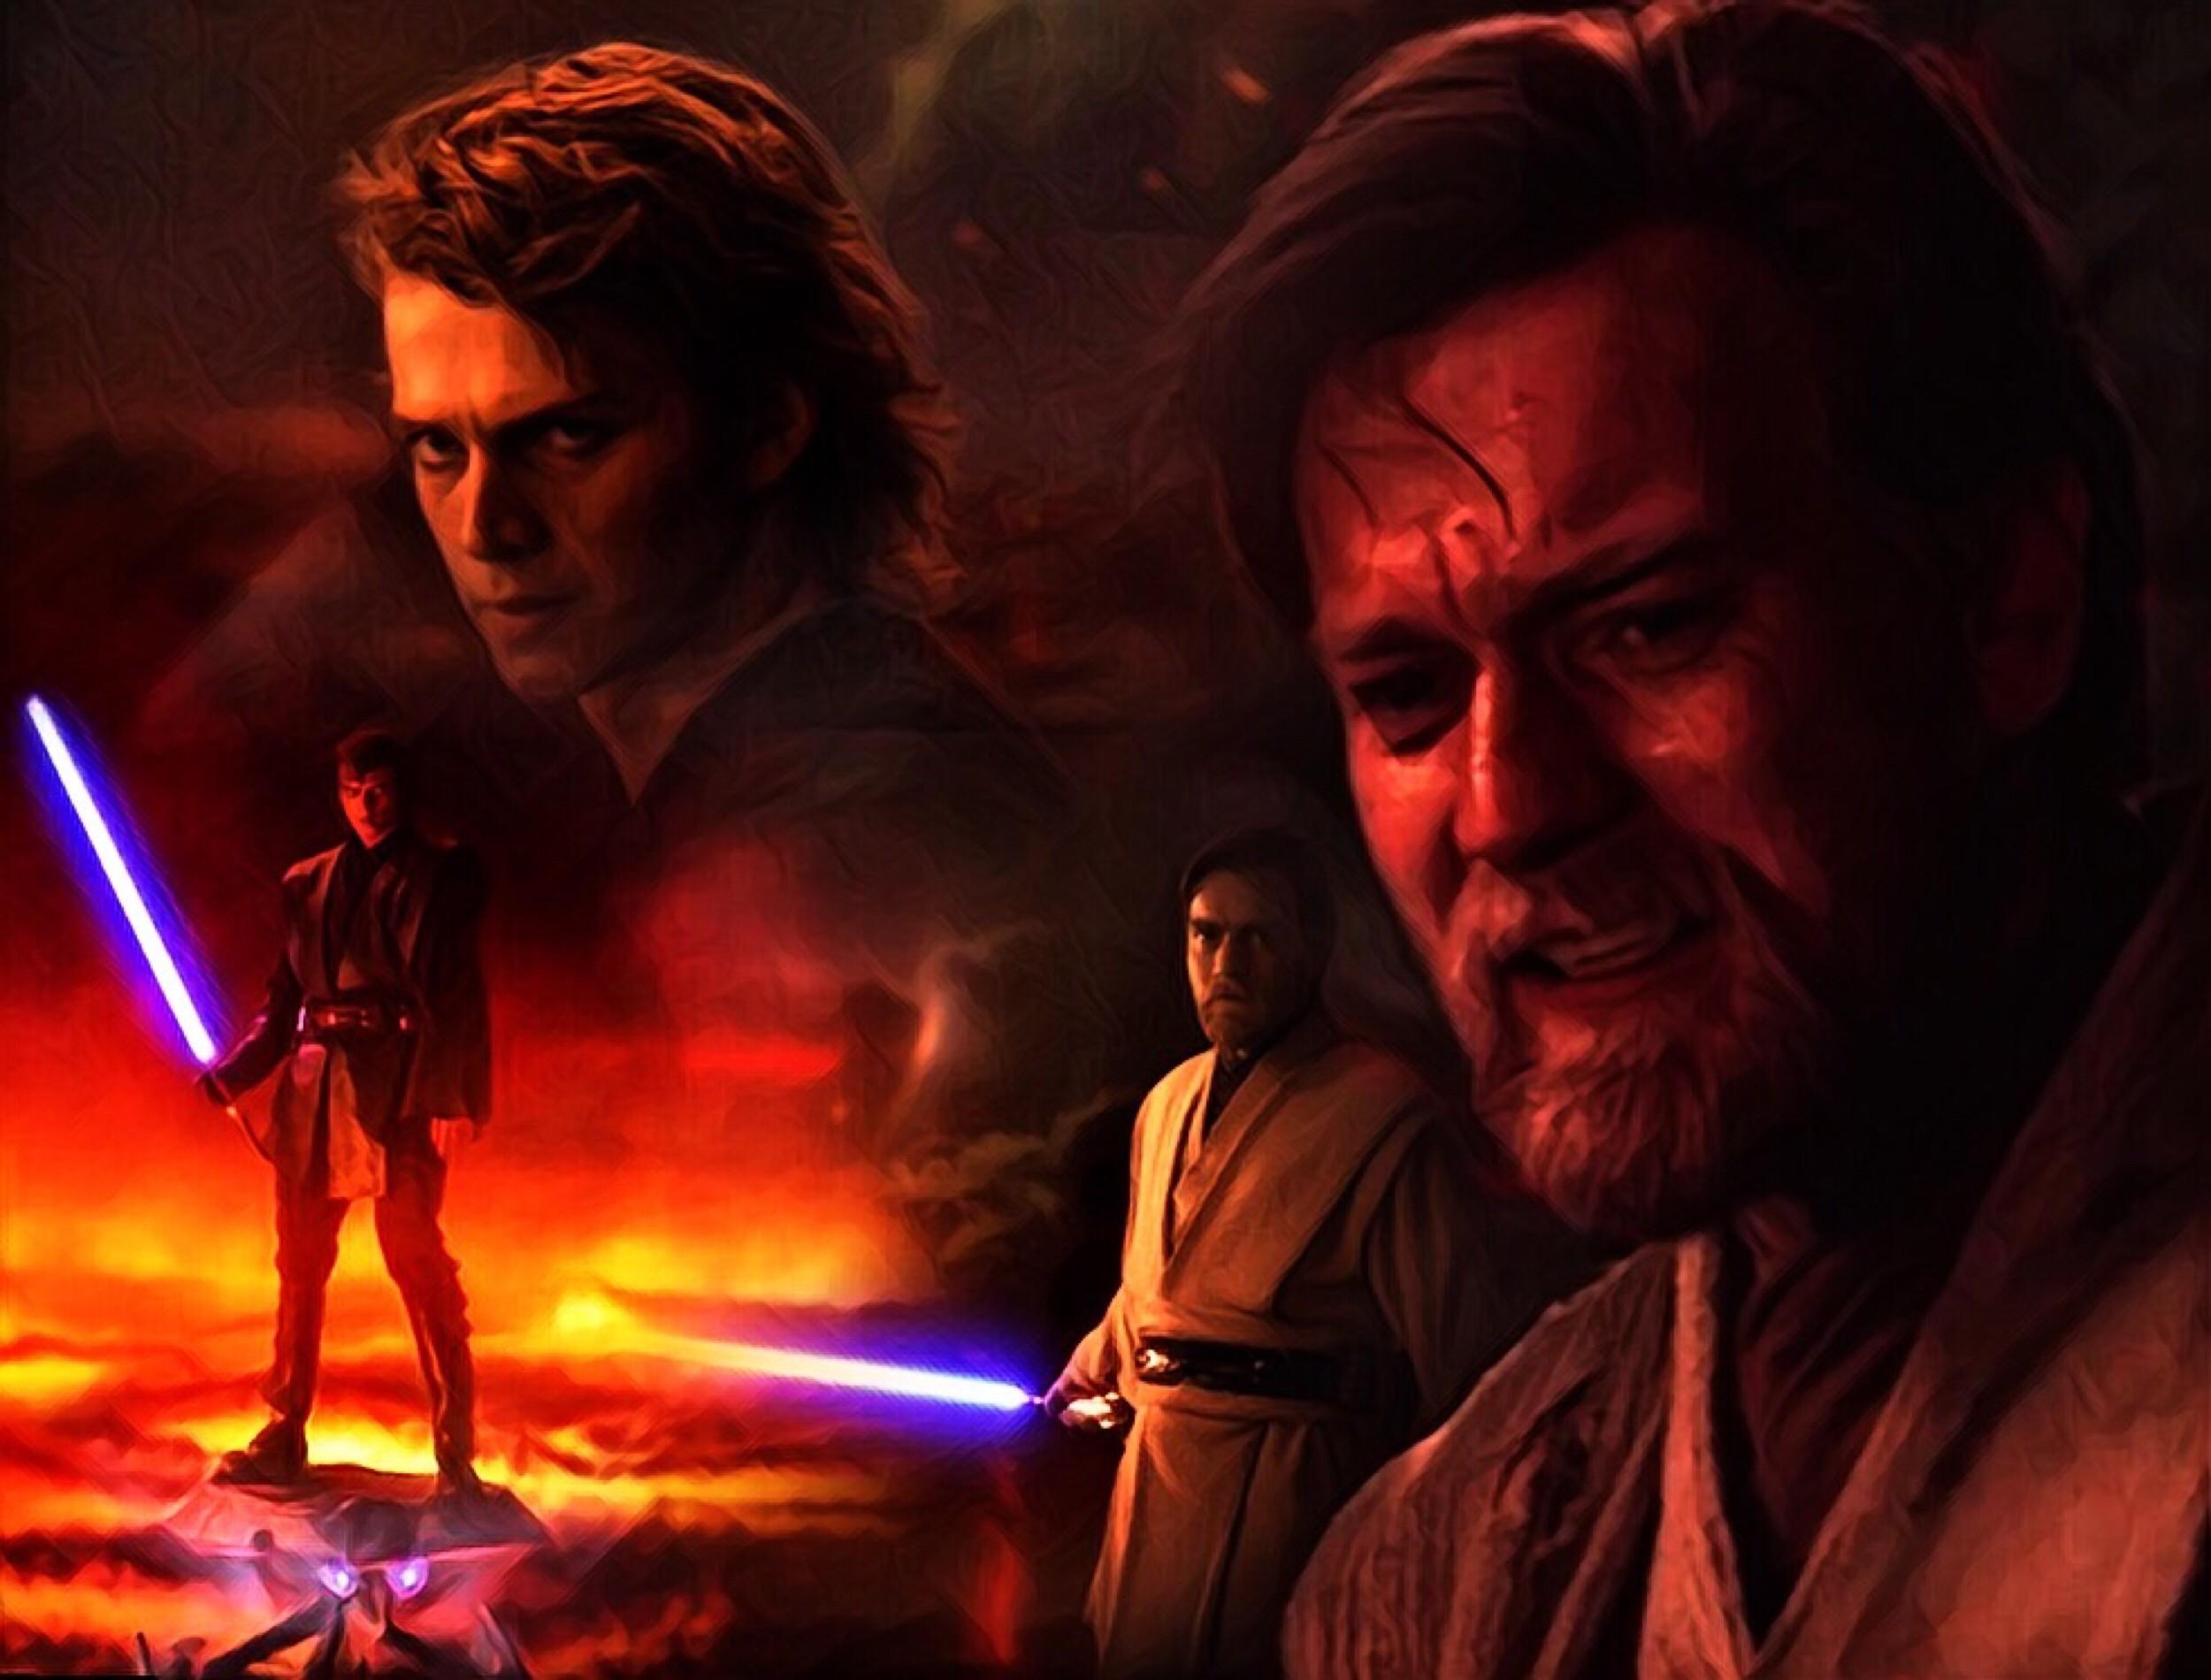 … Obi-Wan VS Darth Vader Wallpaper by Drum-Solo-1986